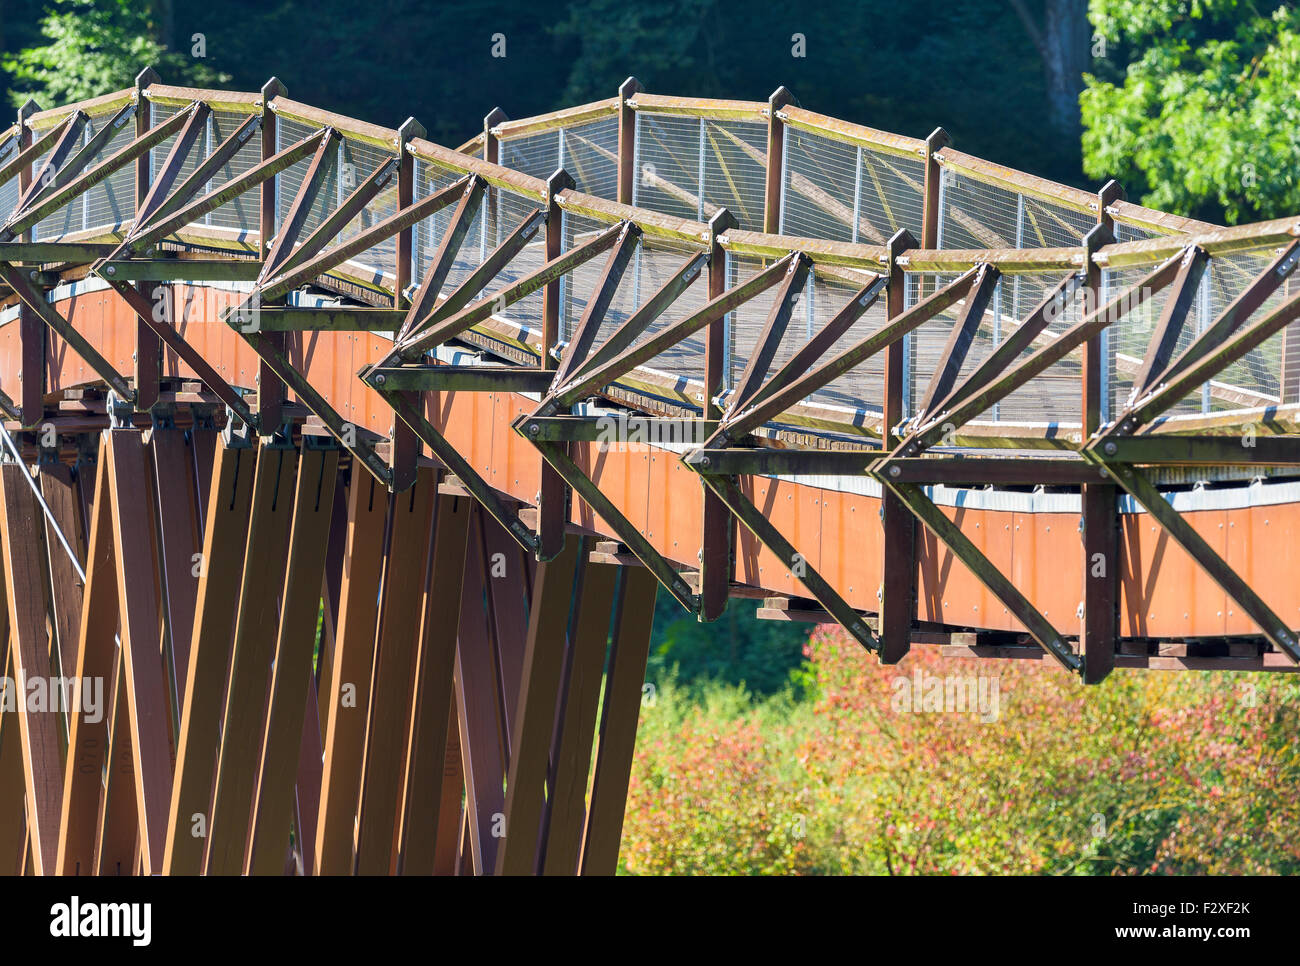 waved wooden bridge in Essing, Altmühltal, Bavaria, 'Oberpfalz' Germany. called Tatzelwurm, Longest - Stock Image